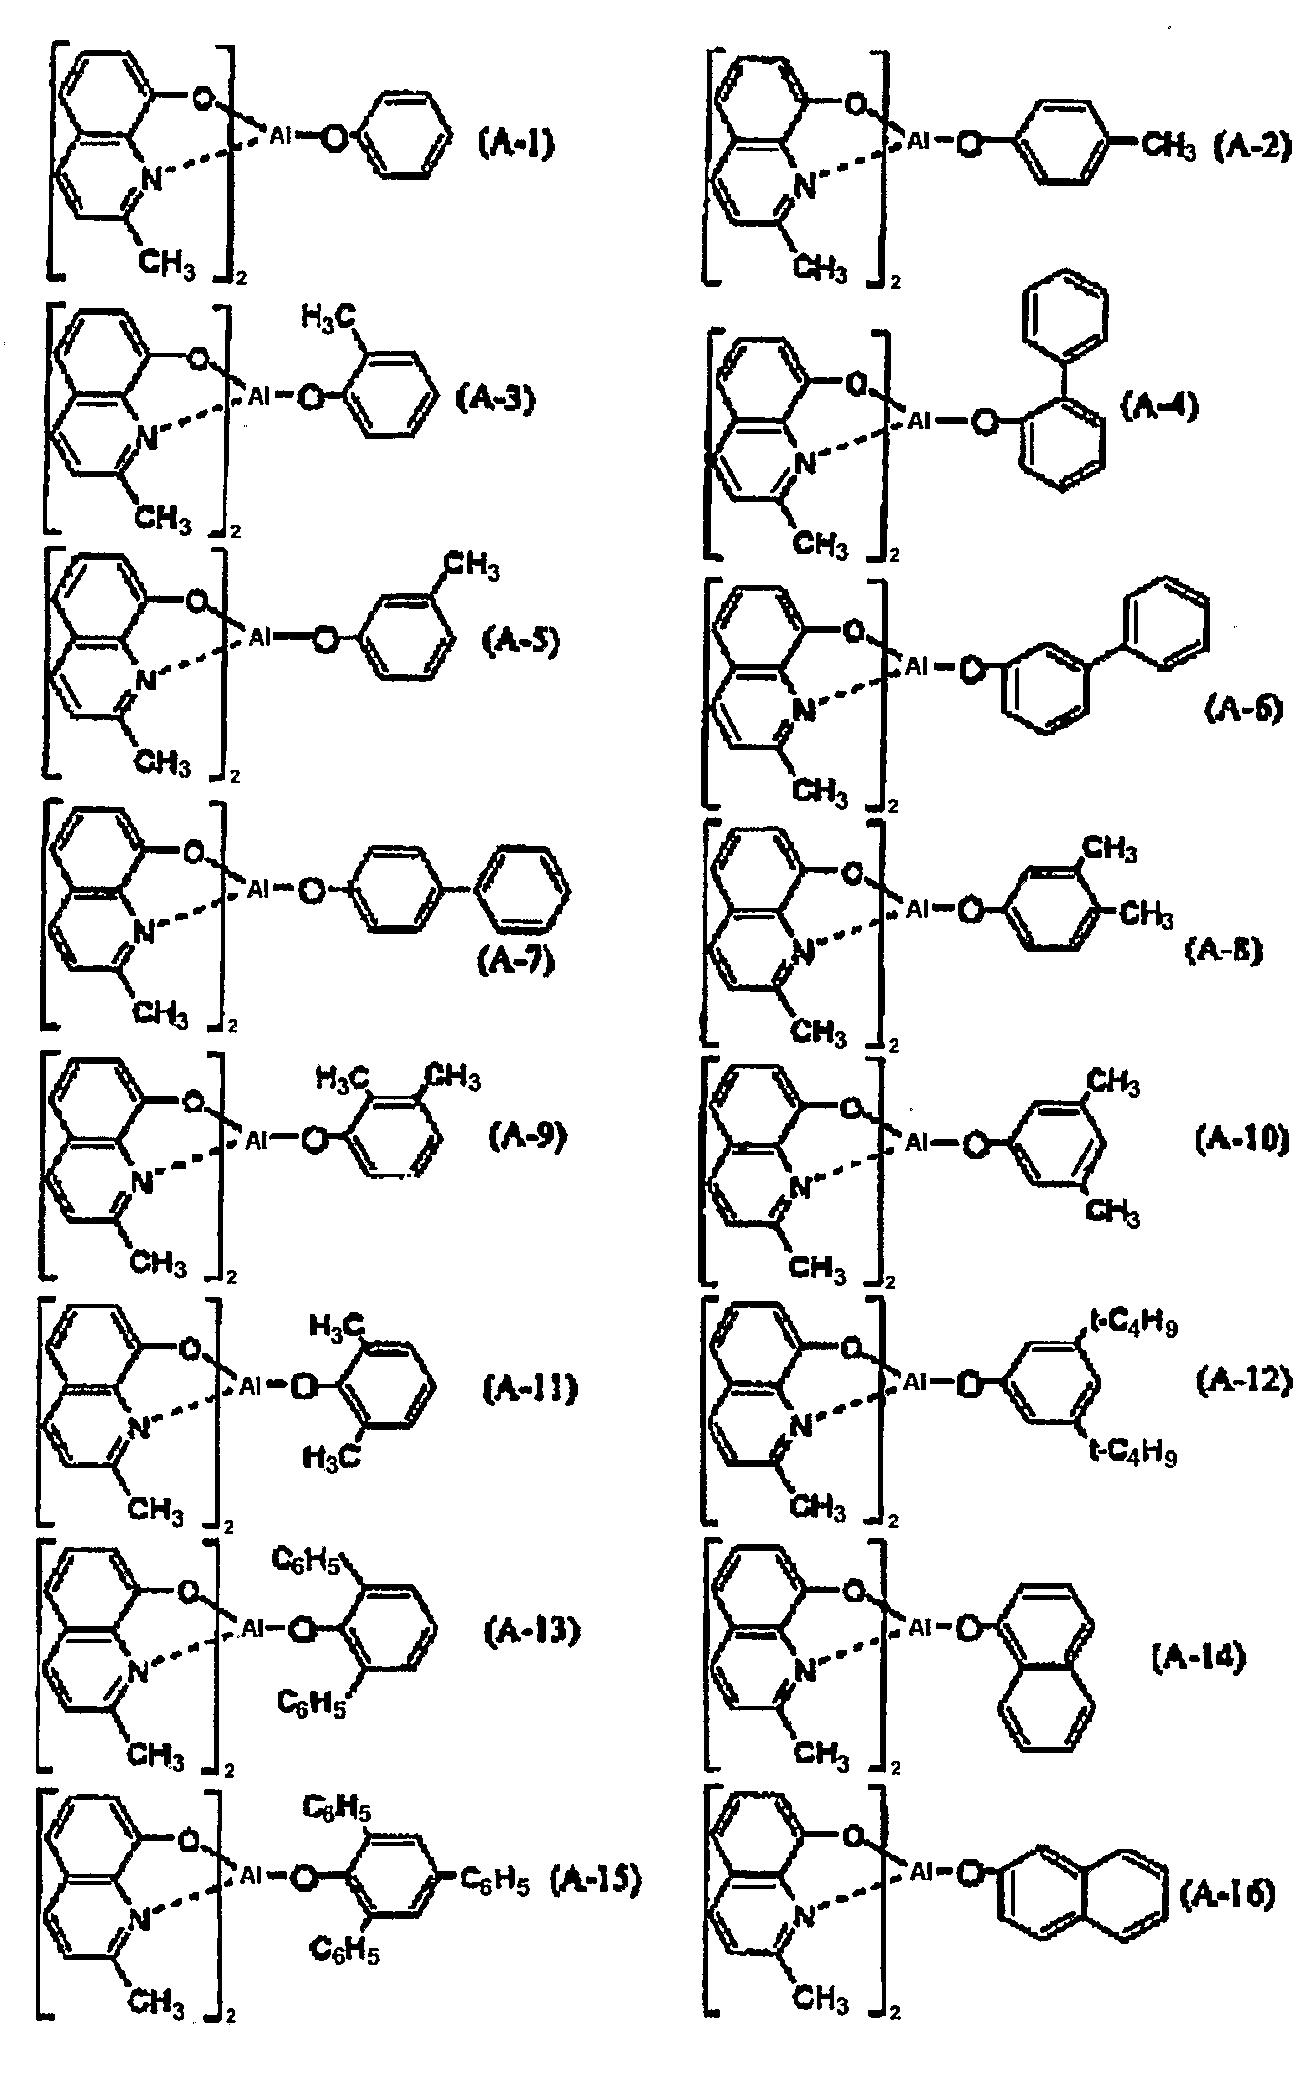 Figure WO-DOC-CHEMICAL-23